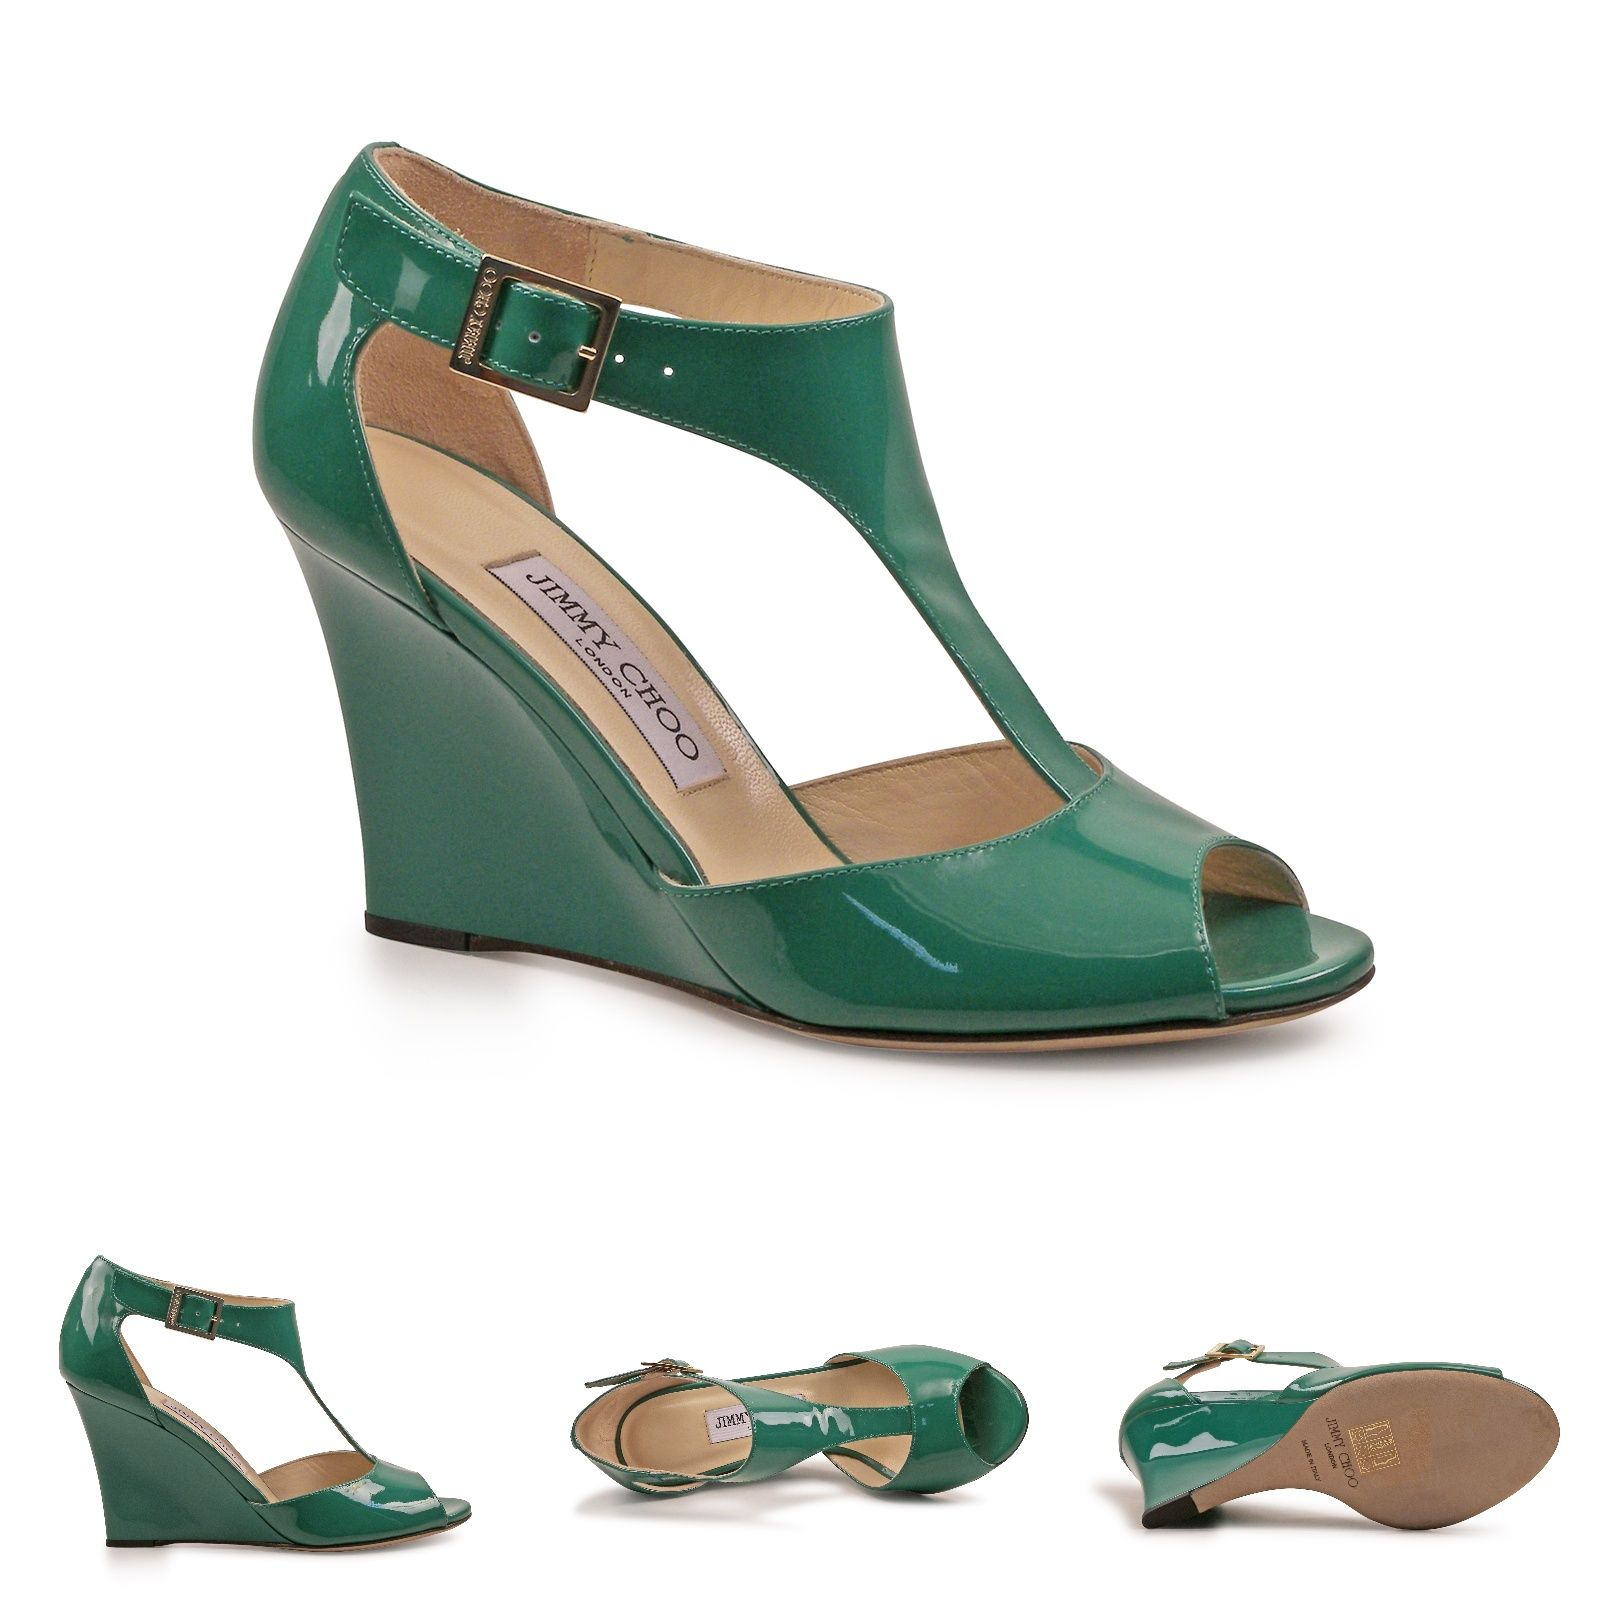 ee5efbc635f9 Jimmy Choo Emerald green Patent Leather wedges sandals open toe ...